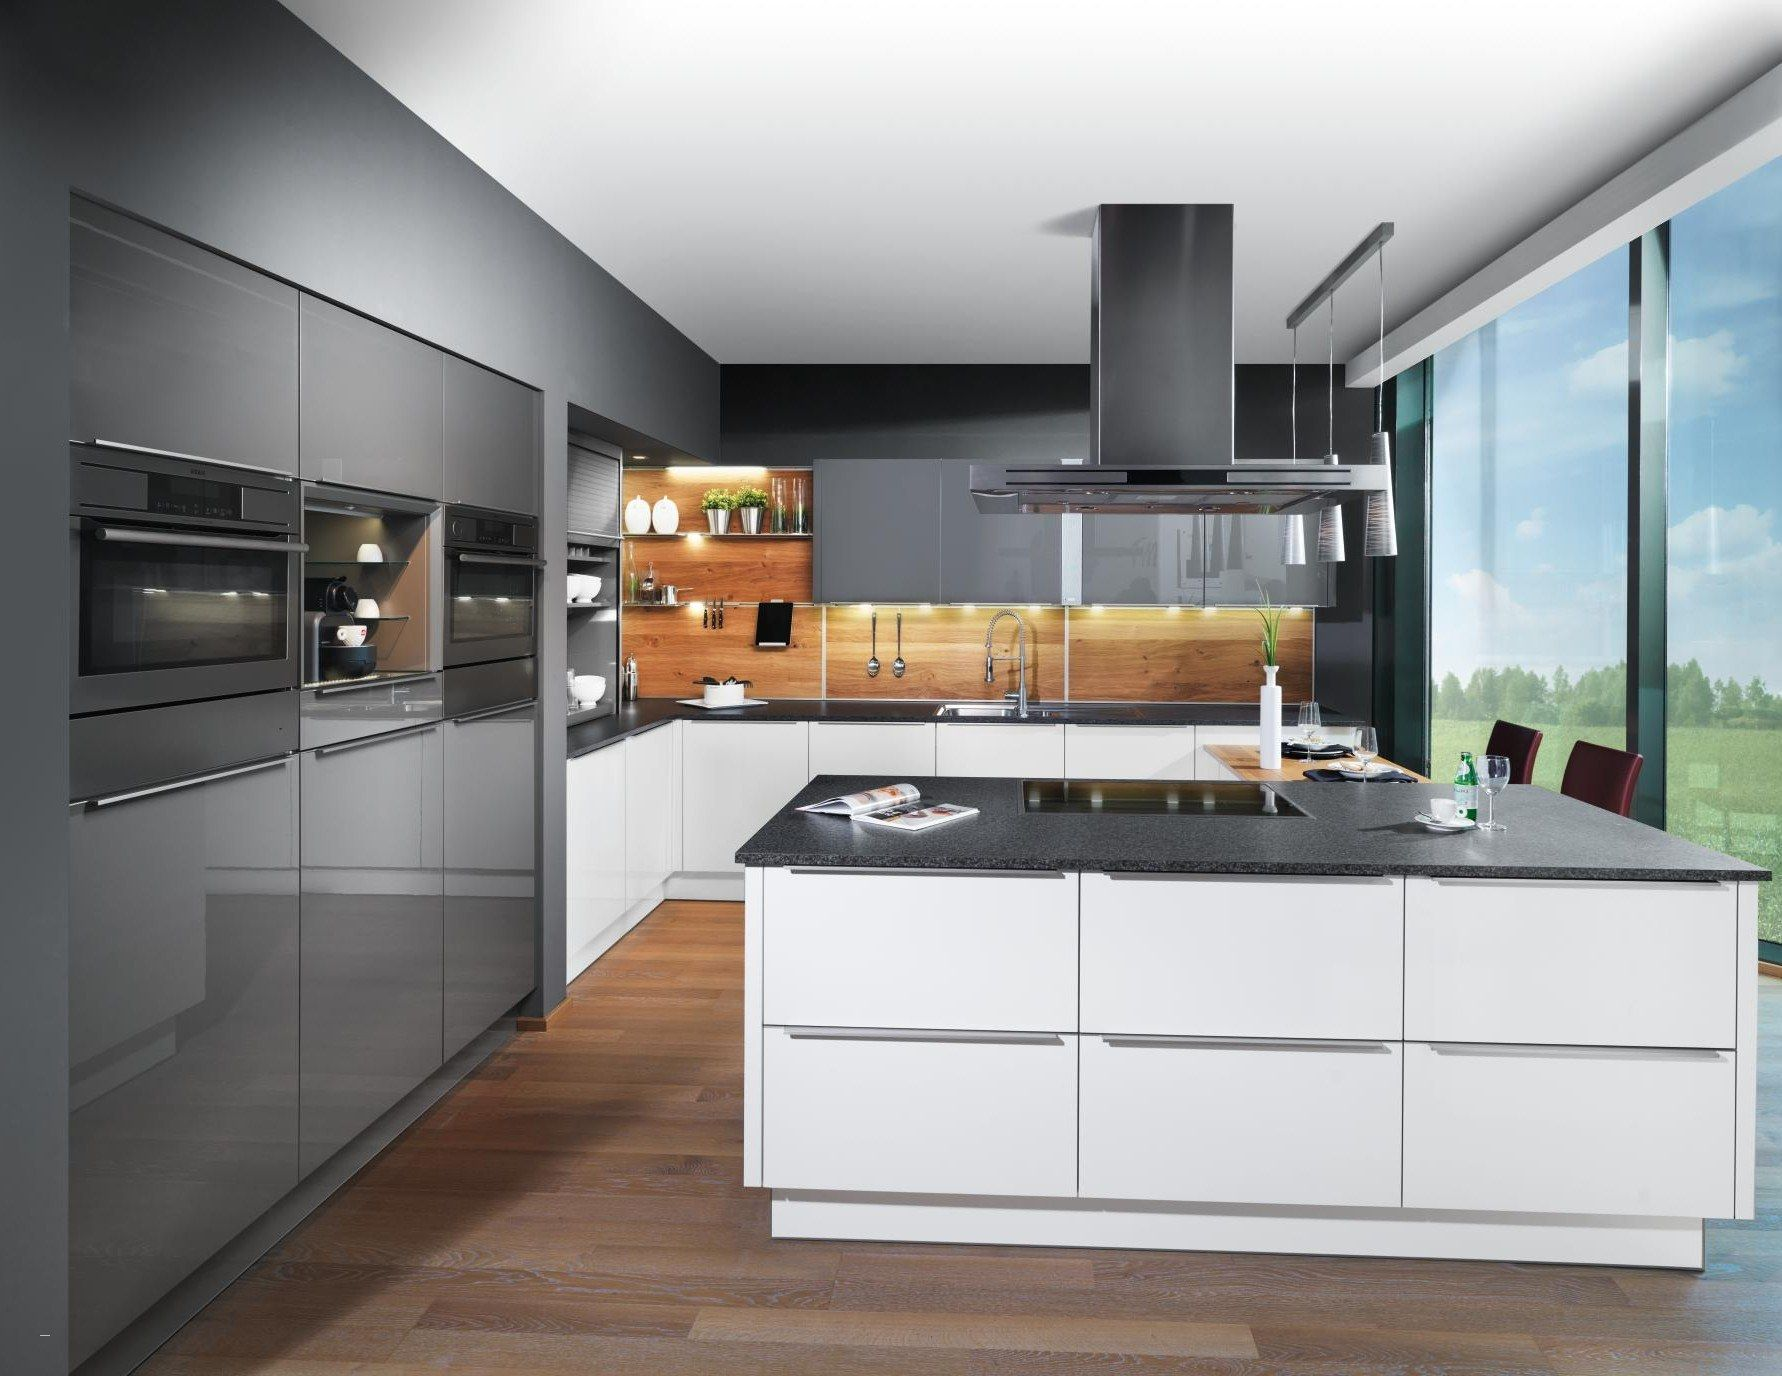 Küche Mit Holzboden Beliebt Kuchen Wandfliesen Modern